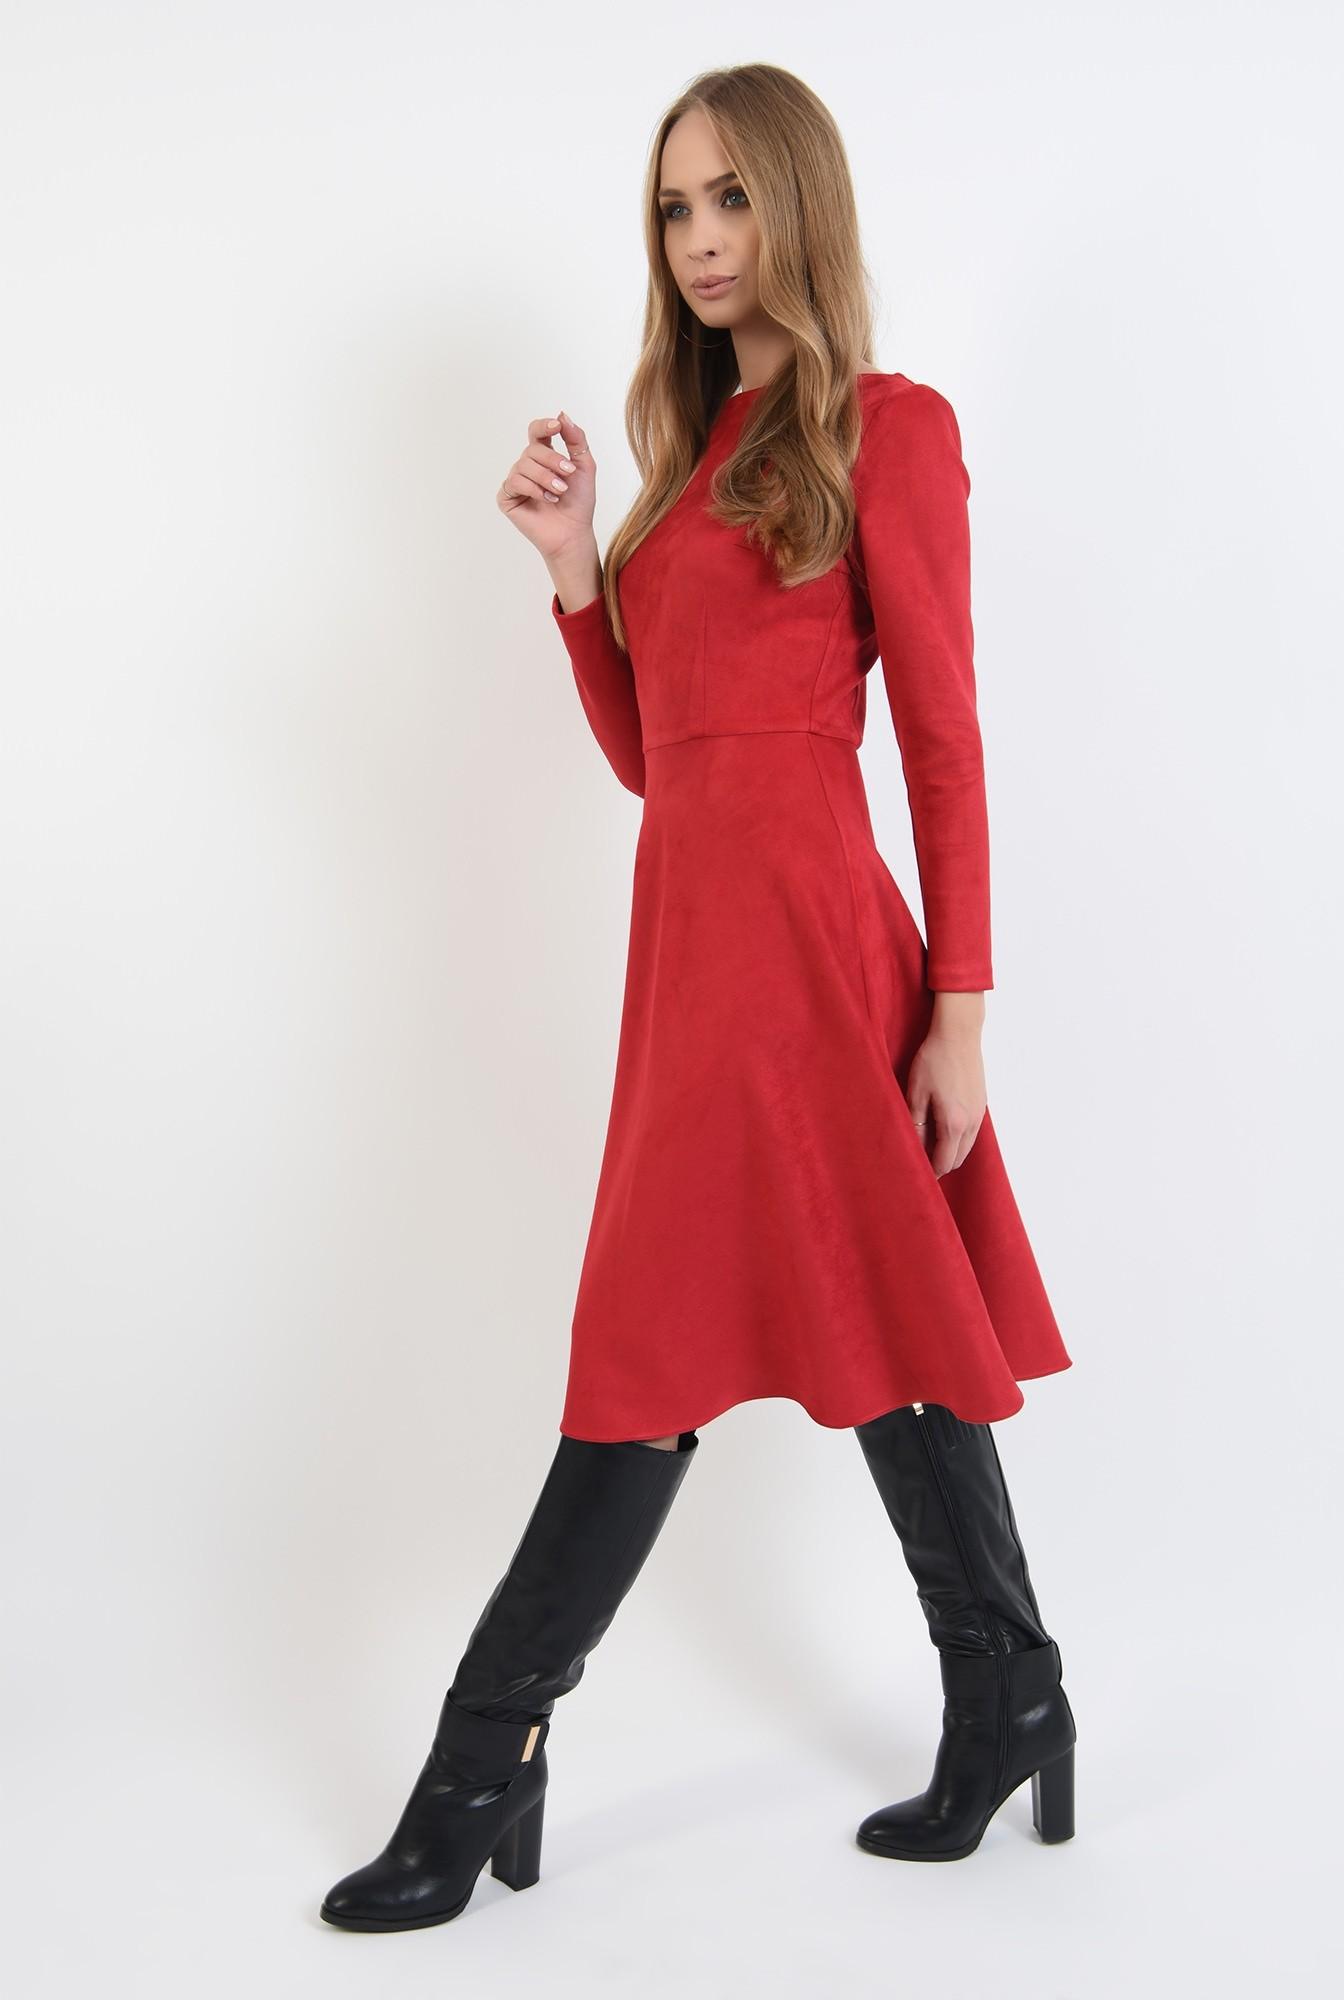 2 - rochie rosie, cu nasturi metalici la spate, evazata